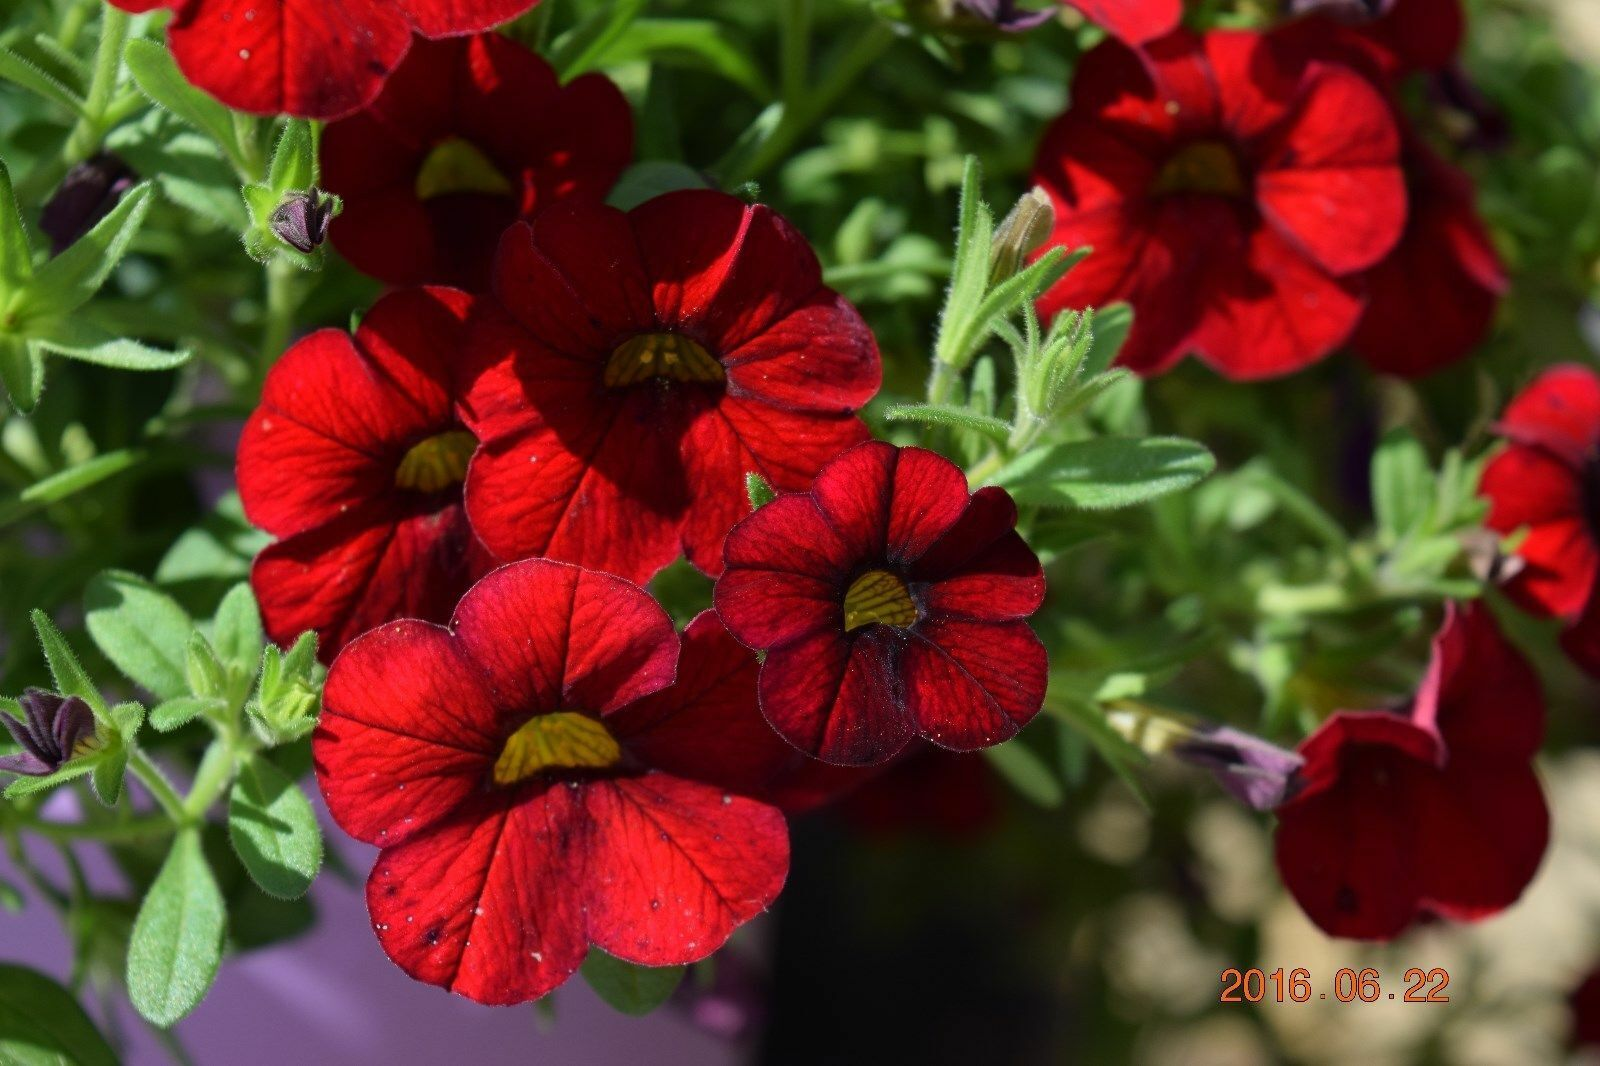 PETUNIA Kabloom Calibrachoa Series RED 20 QUALITY fresh Seeds